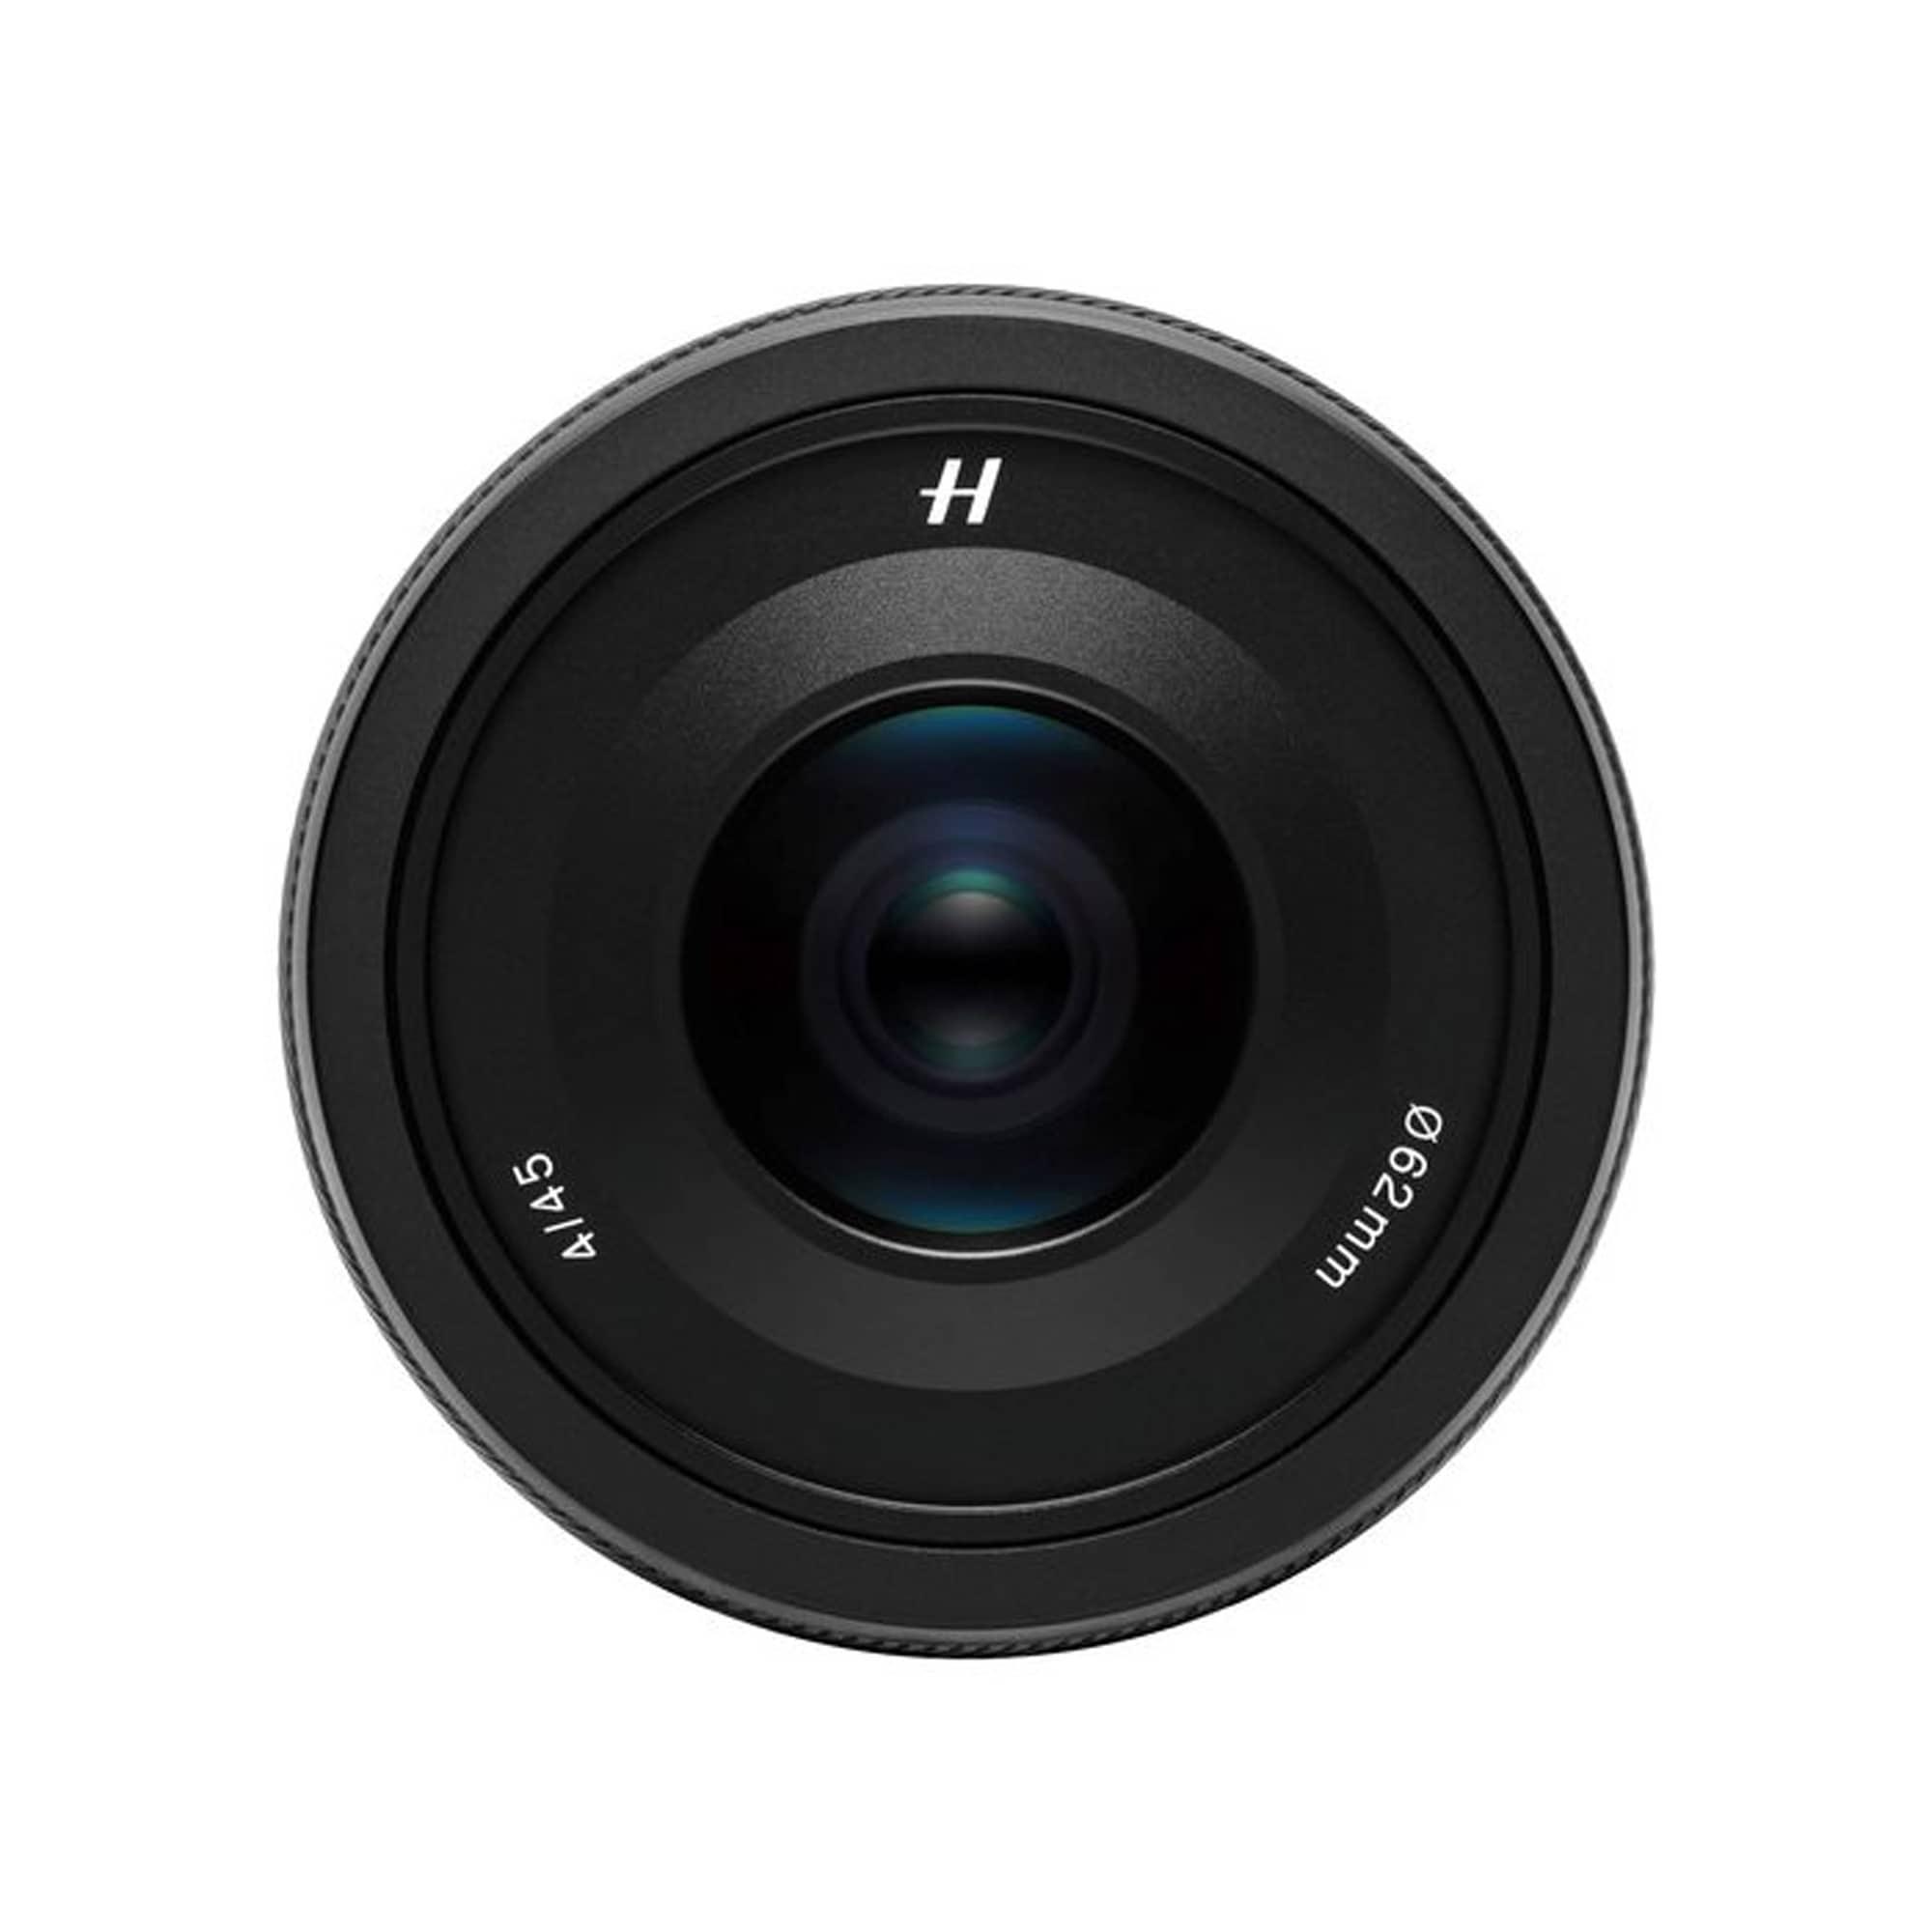 Hasselblad XCD 45mm f/4.0 P